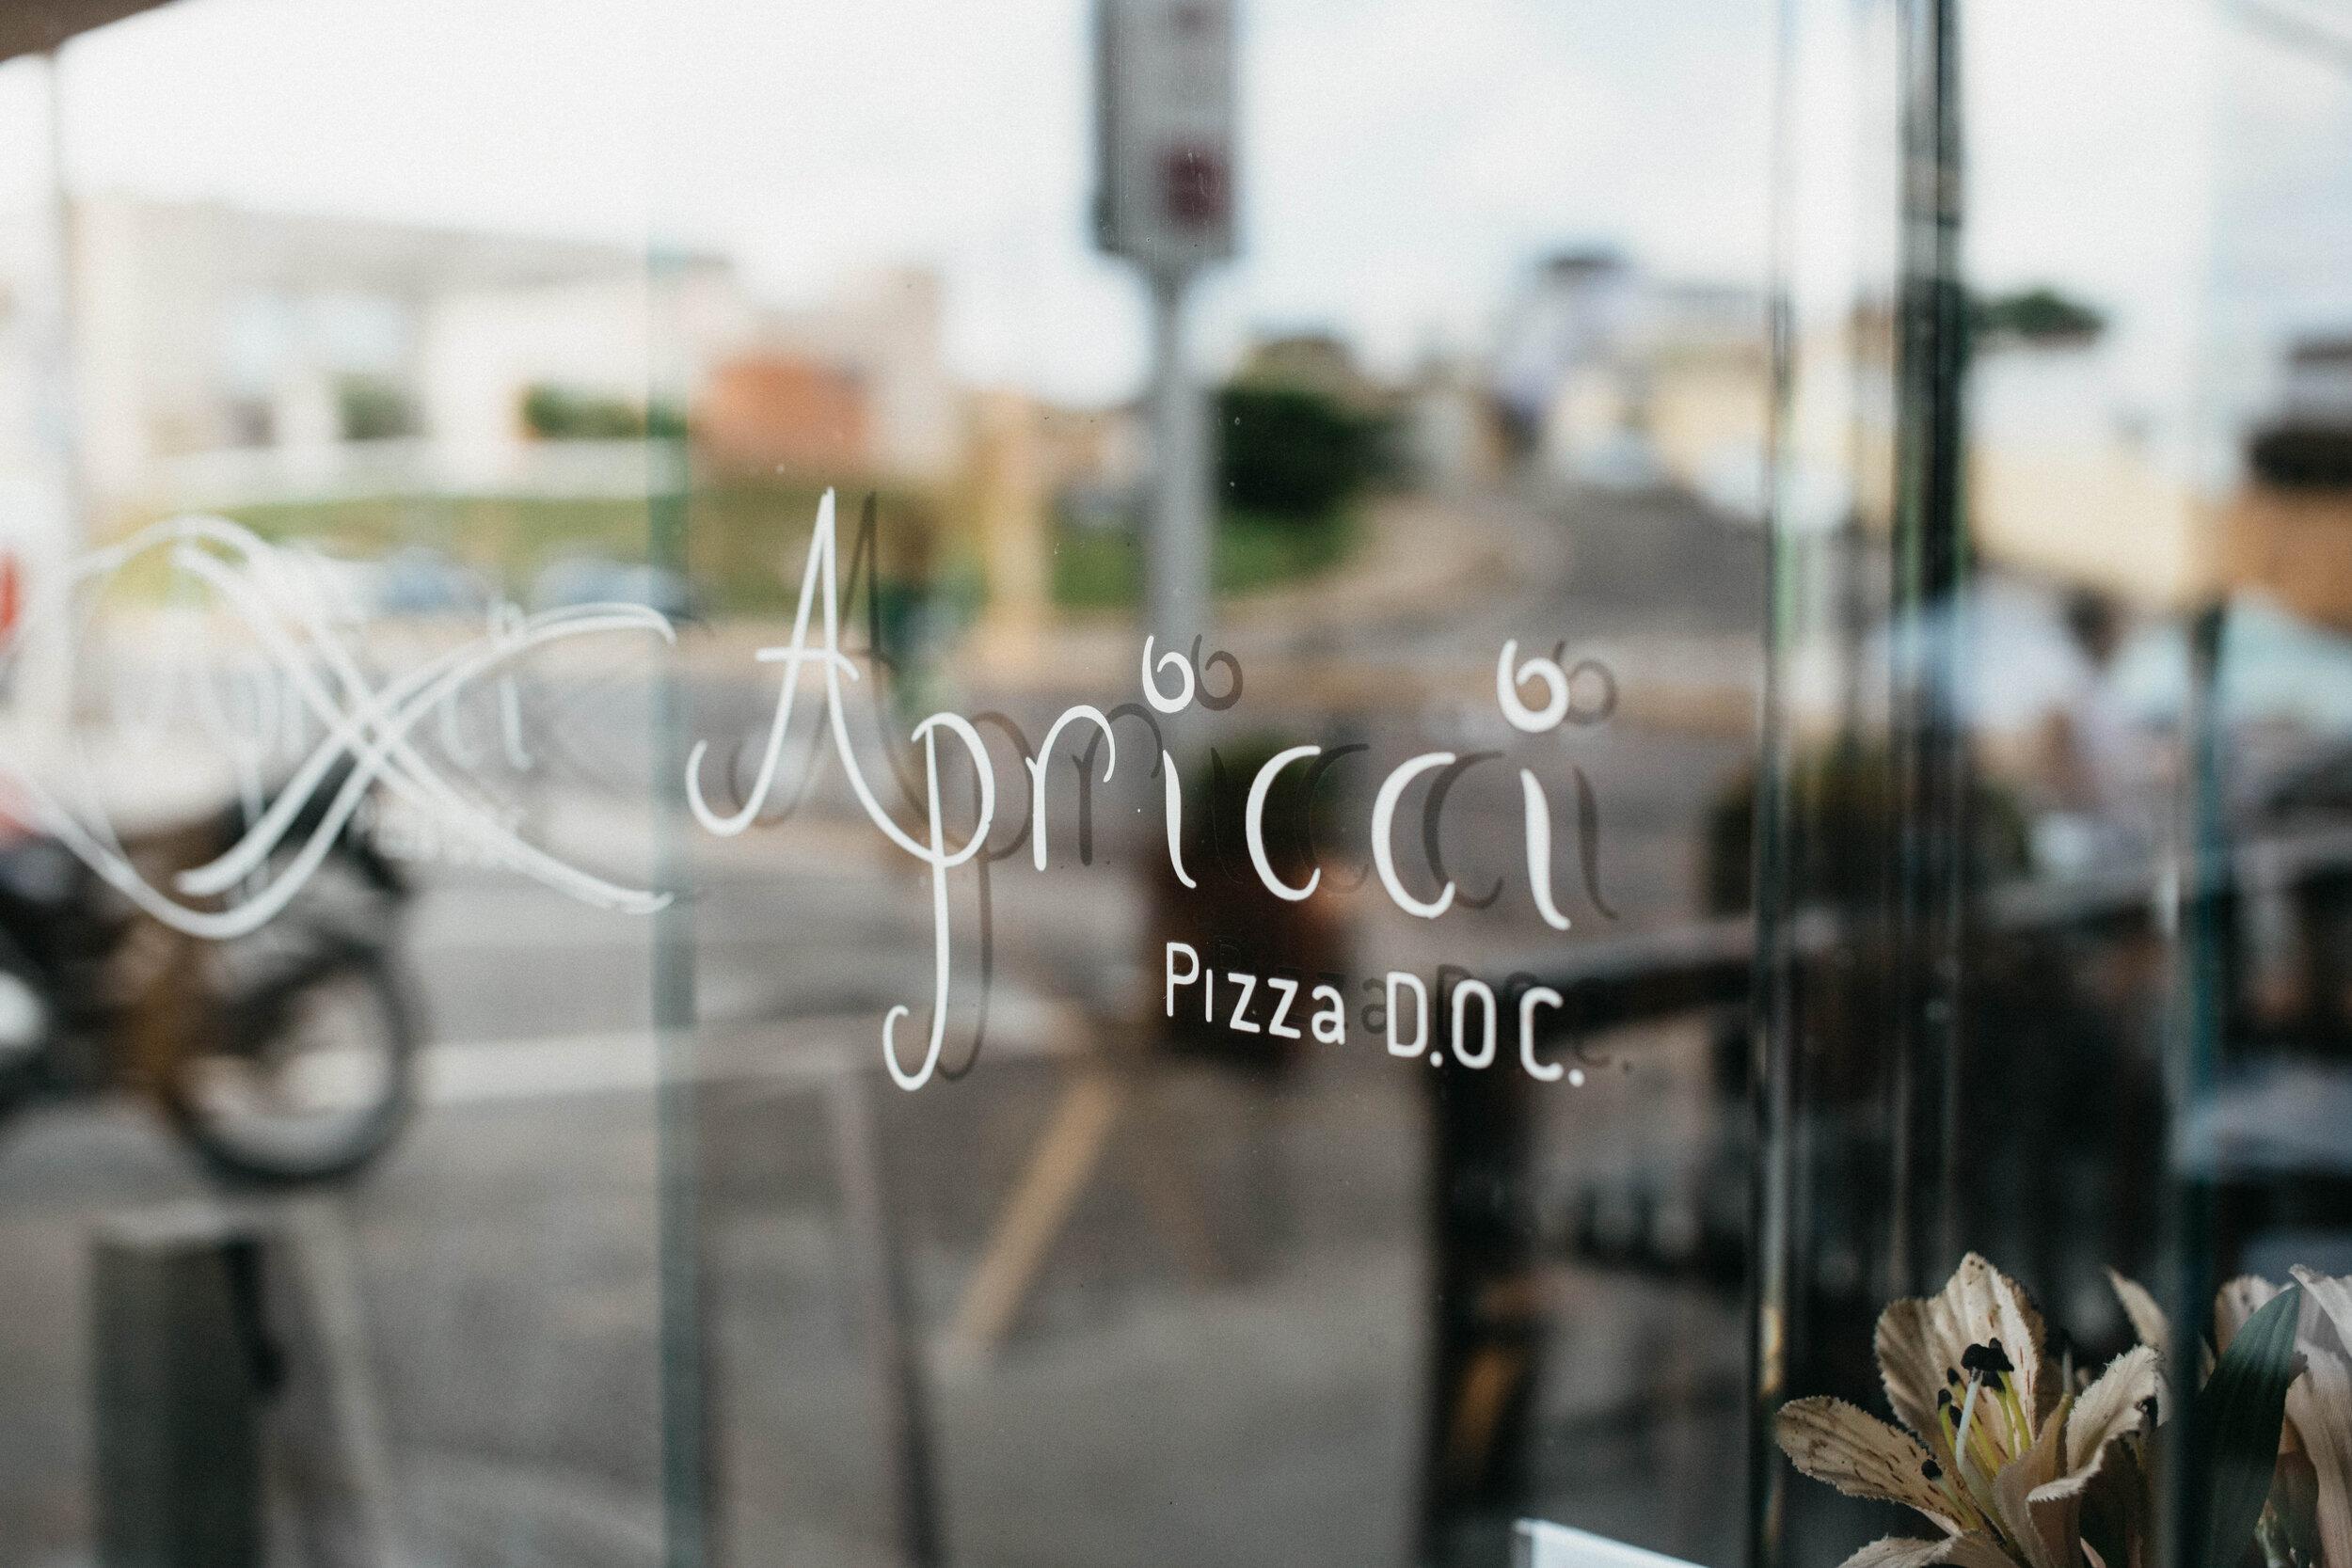 Restaurante Apricci - Itabira - MG